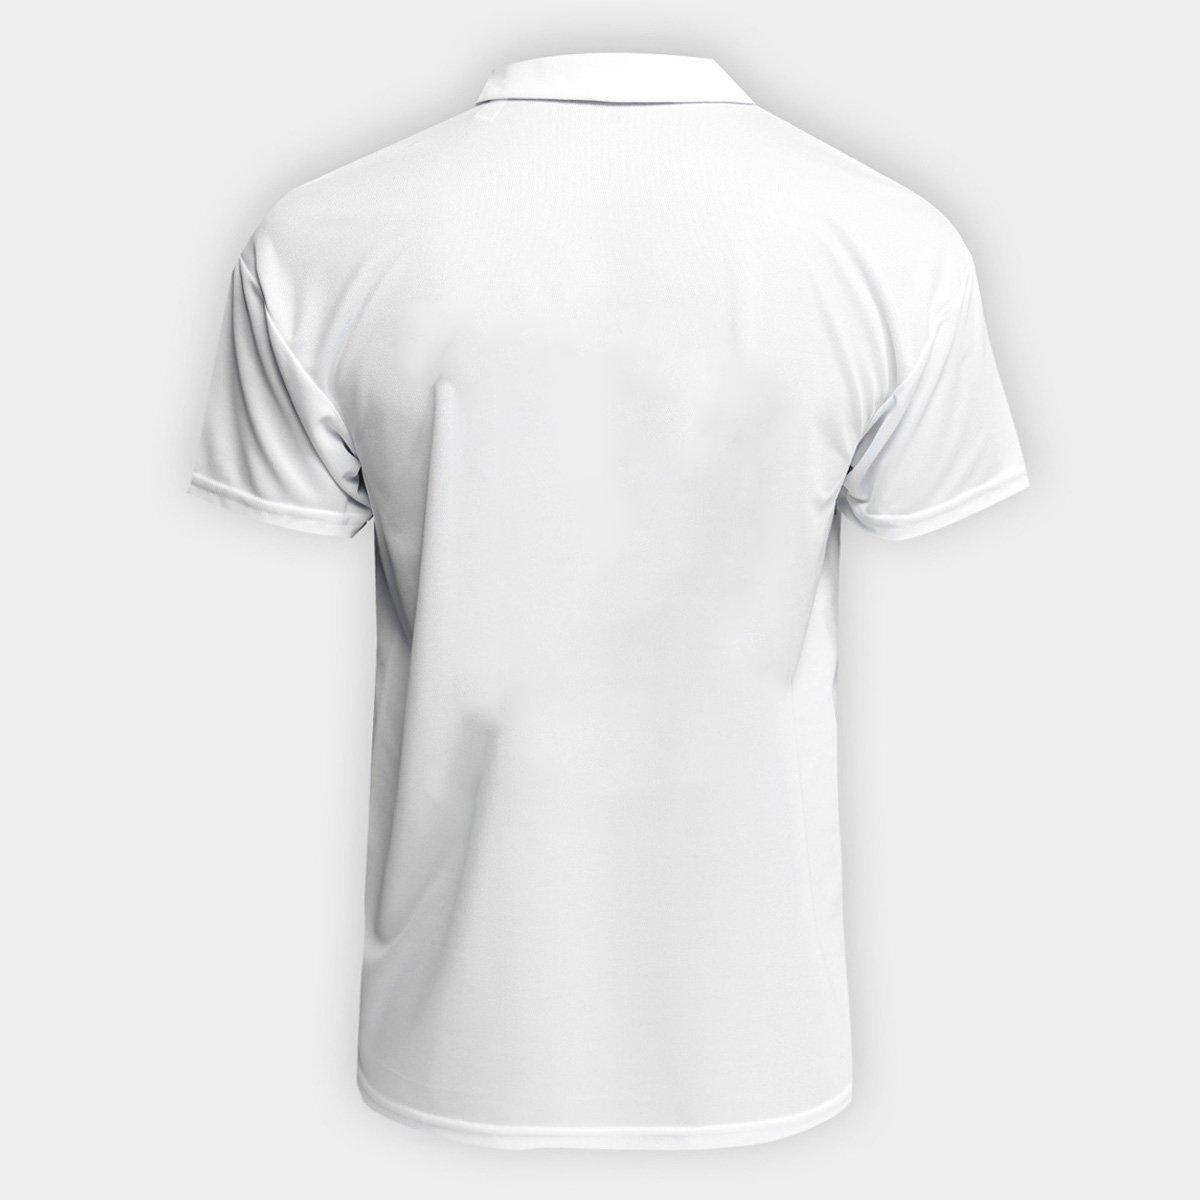 Camisa São Paulo I 2018 s/n° Torcedor Adidas Masculina - 1